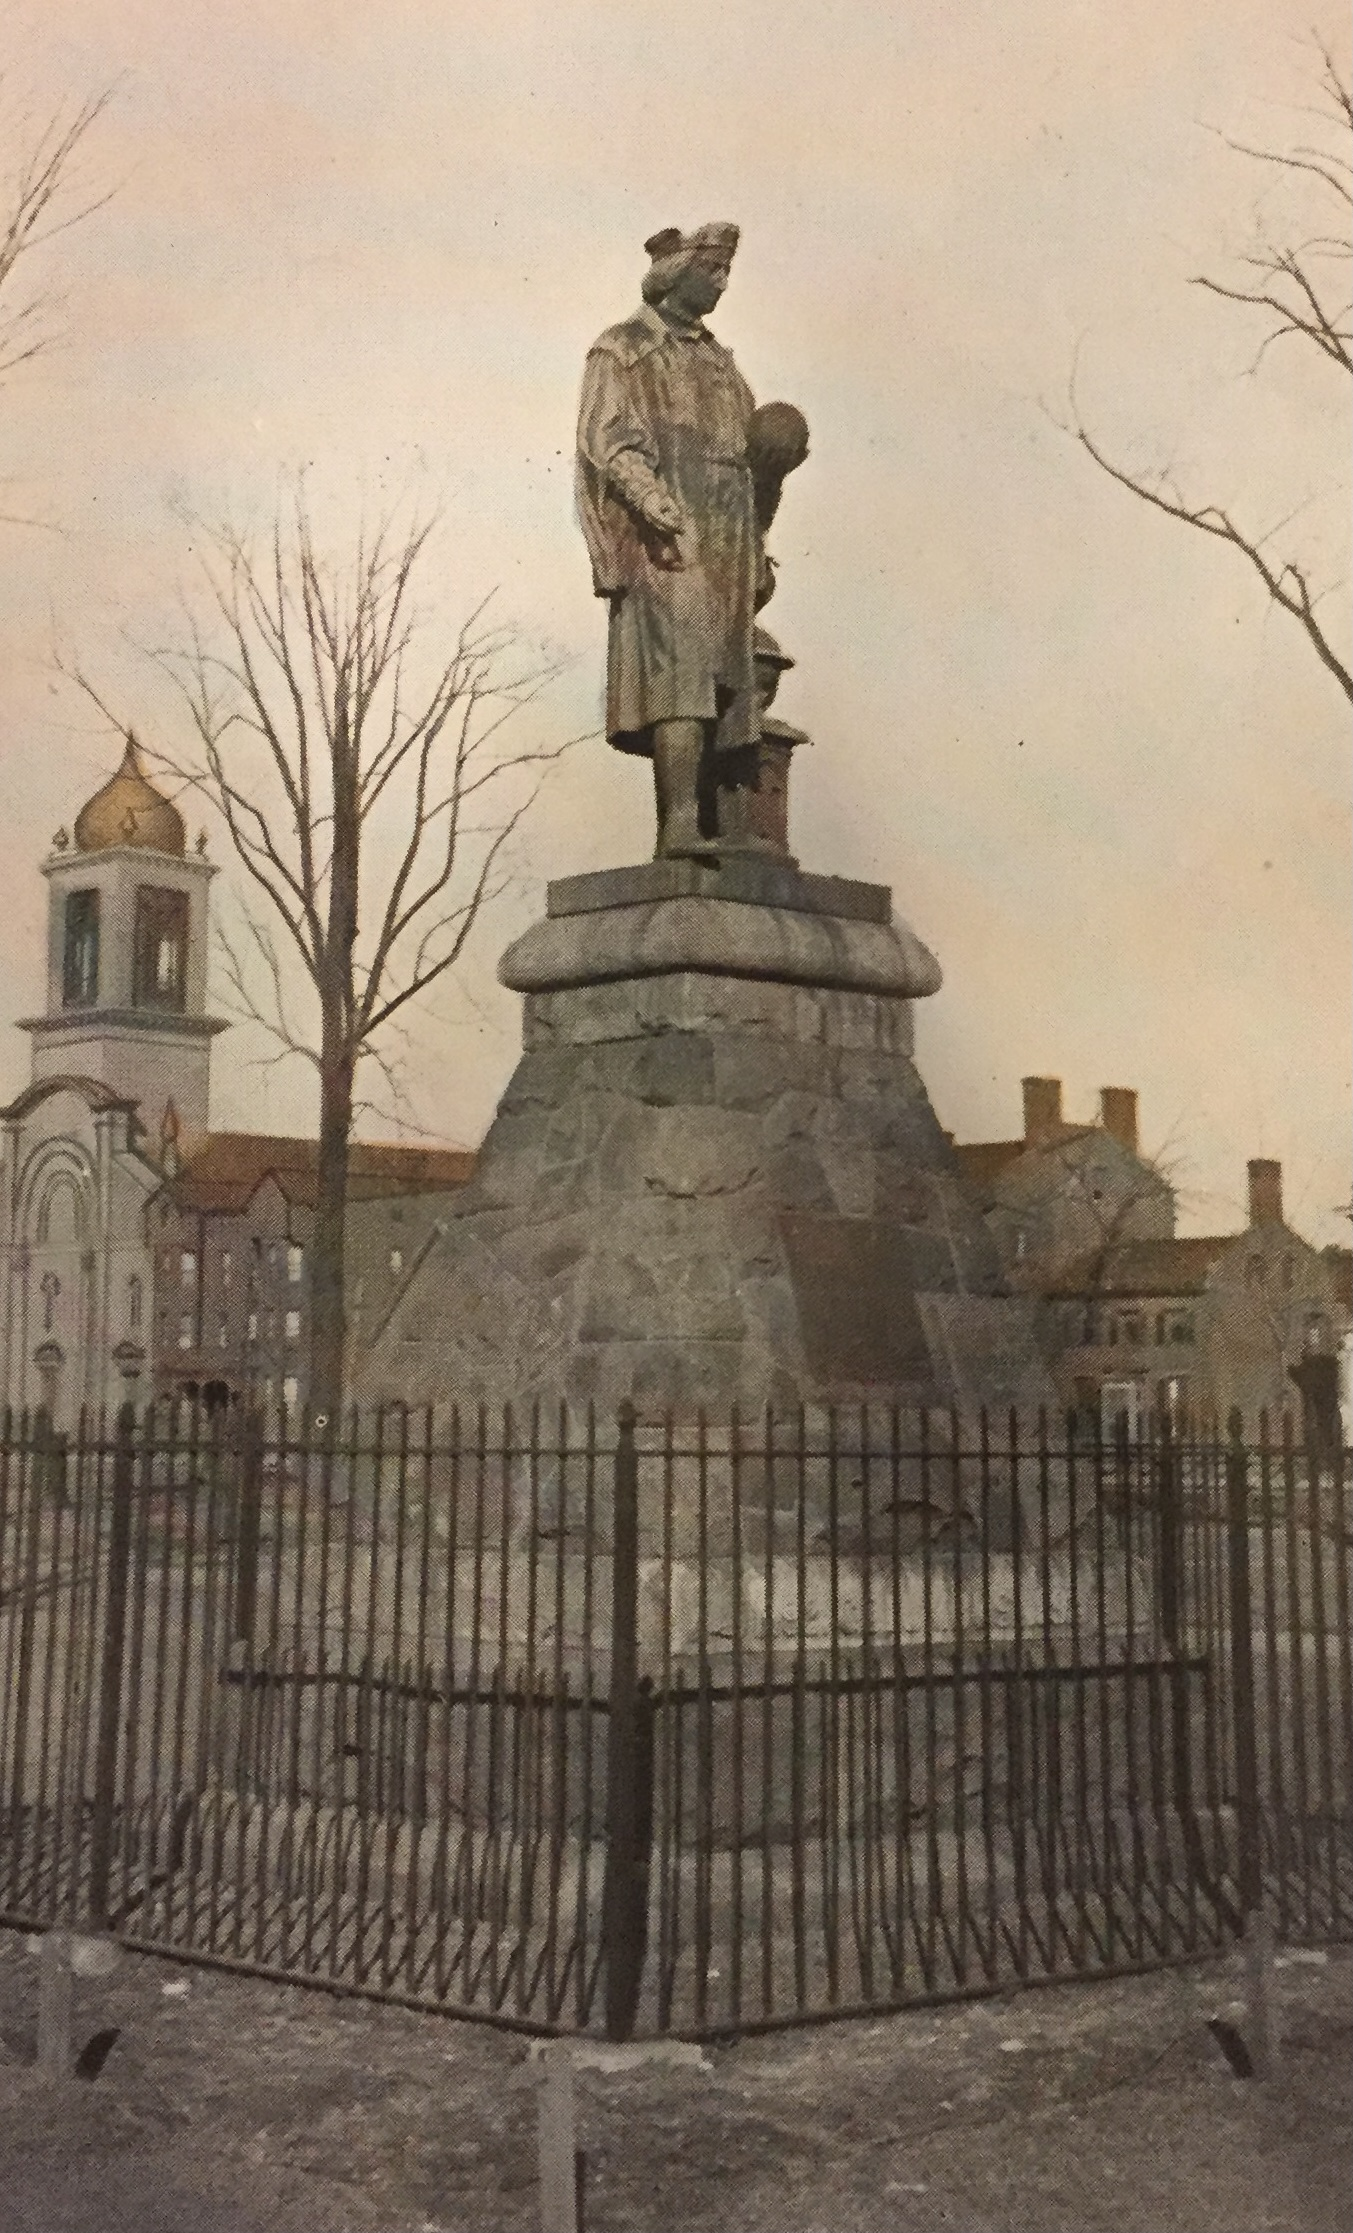 Sky, Pedestal, Statue, Sculpture